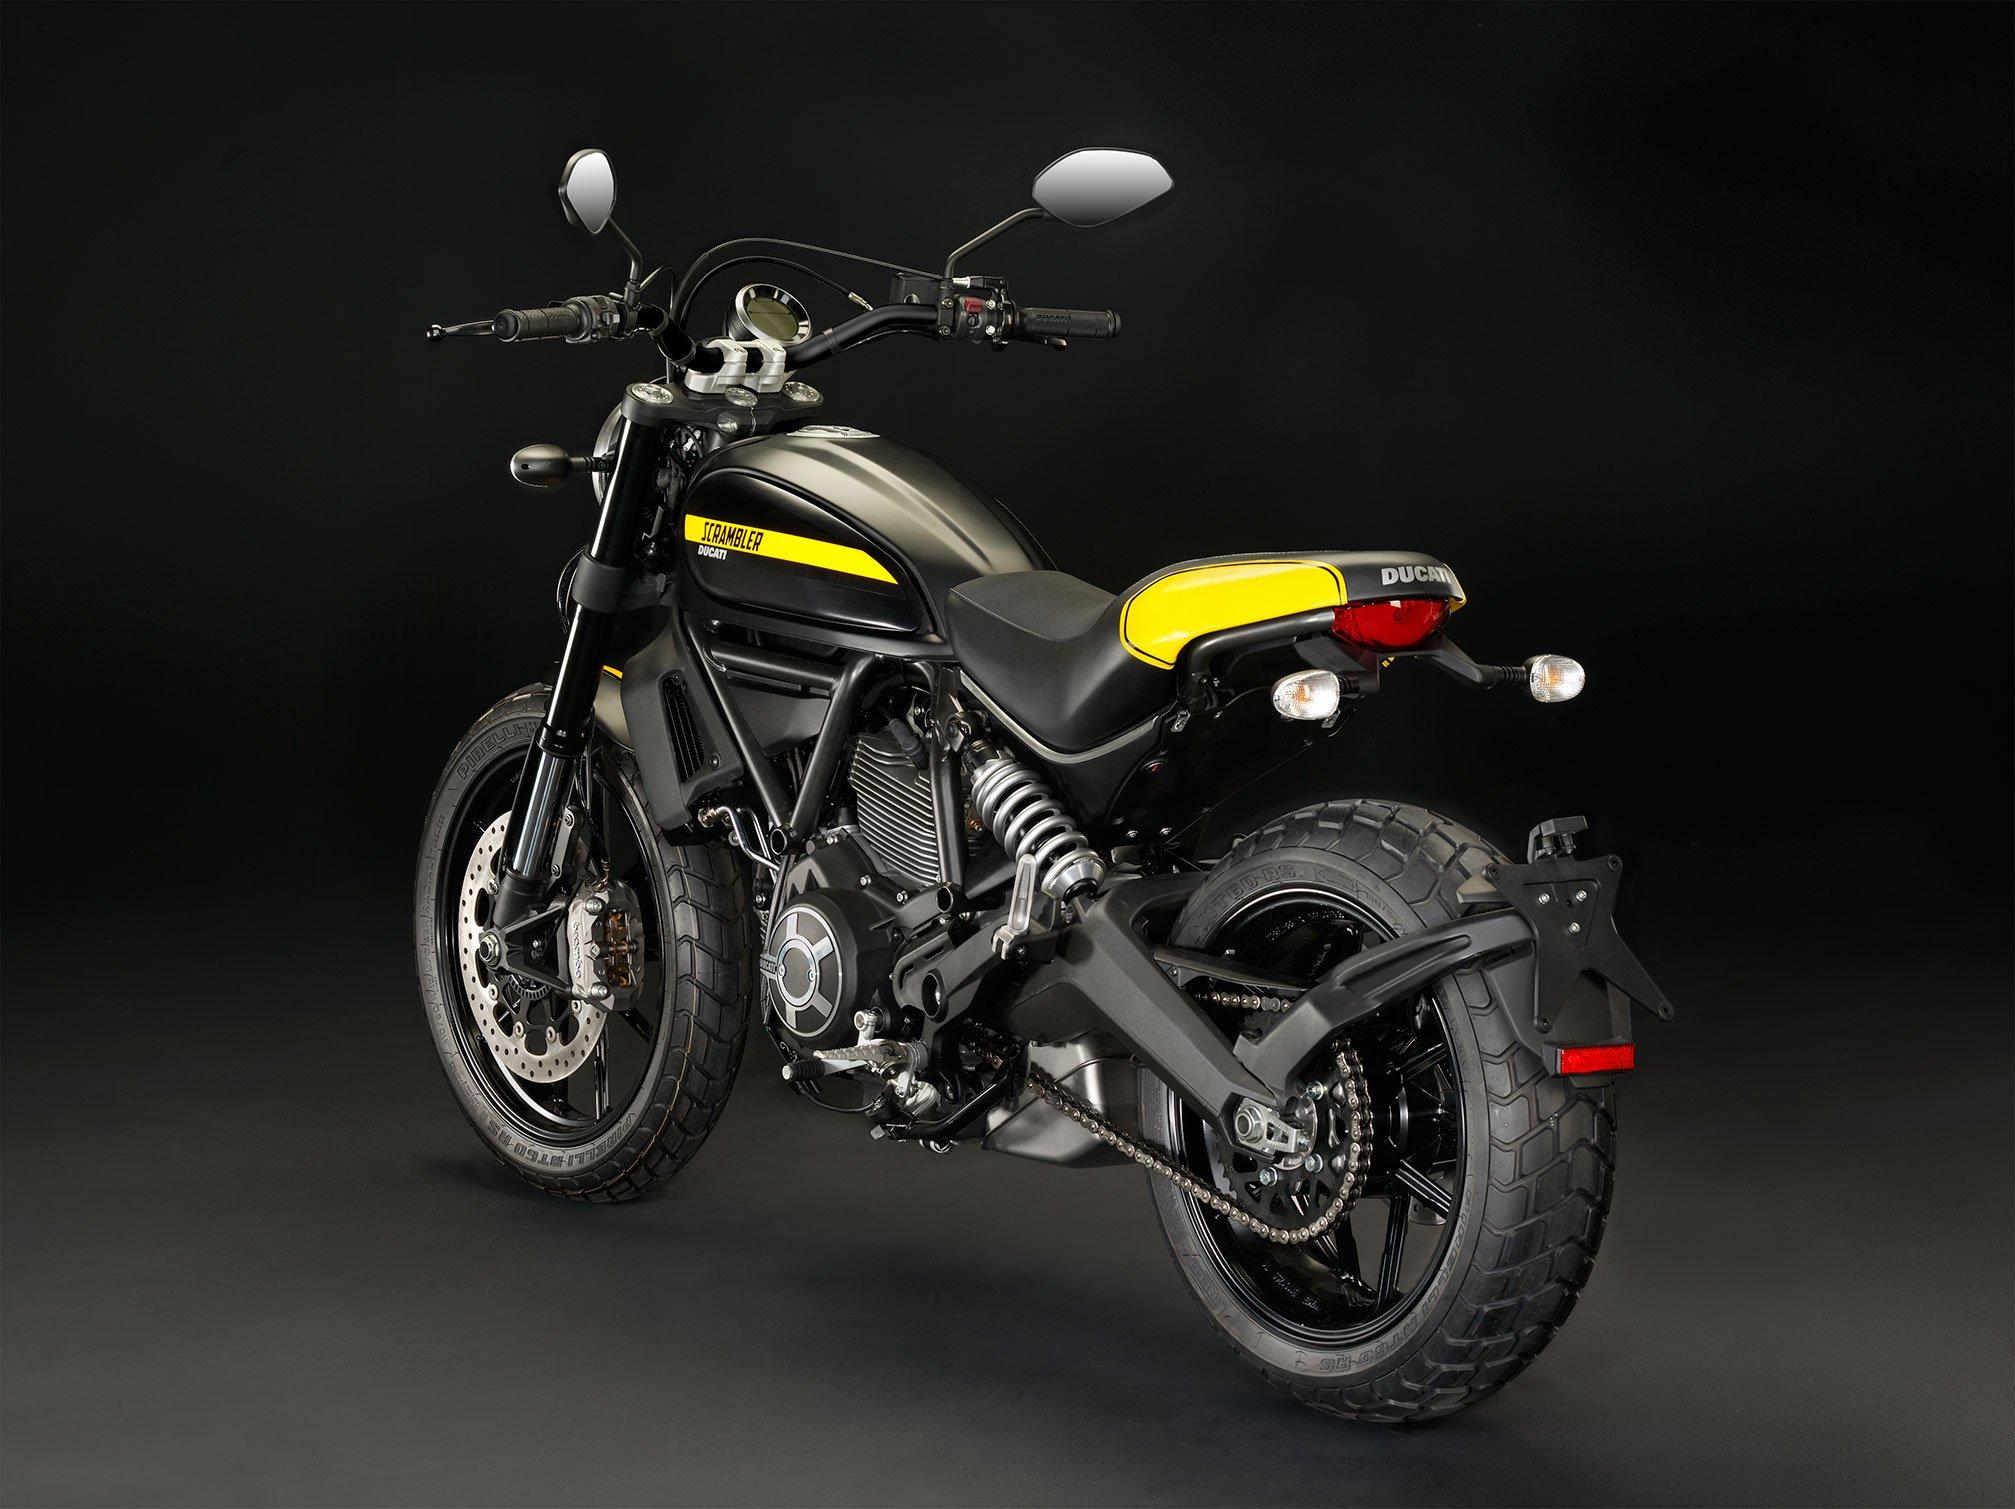 2015 Ducati Scrambler Full Throttle Dirtbike Wallpaper